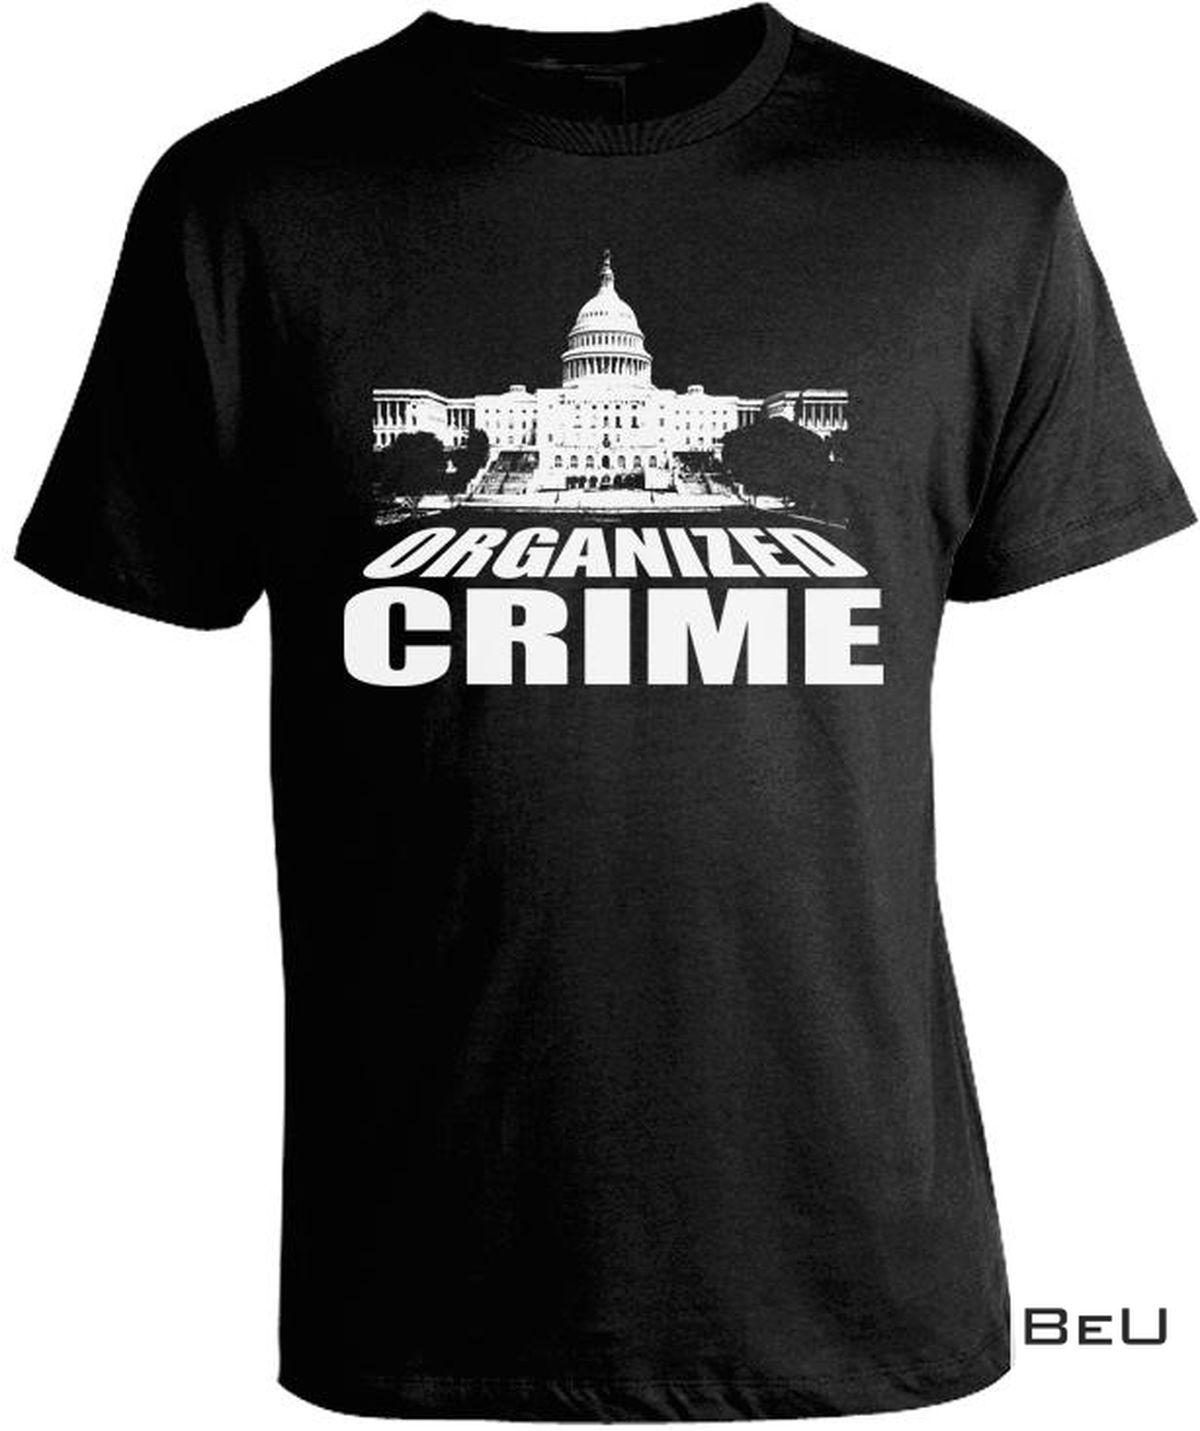 Organized Crime Shirt, Hoodie, Sweatshirt